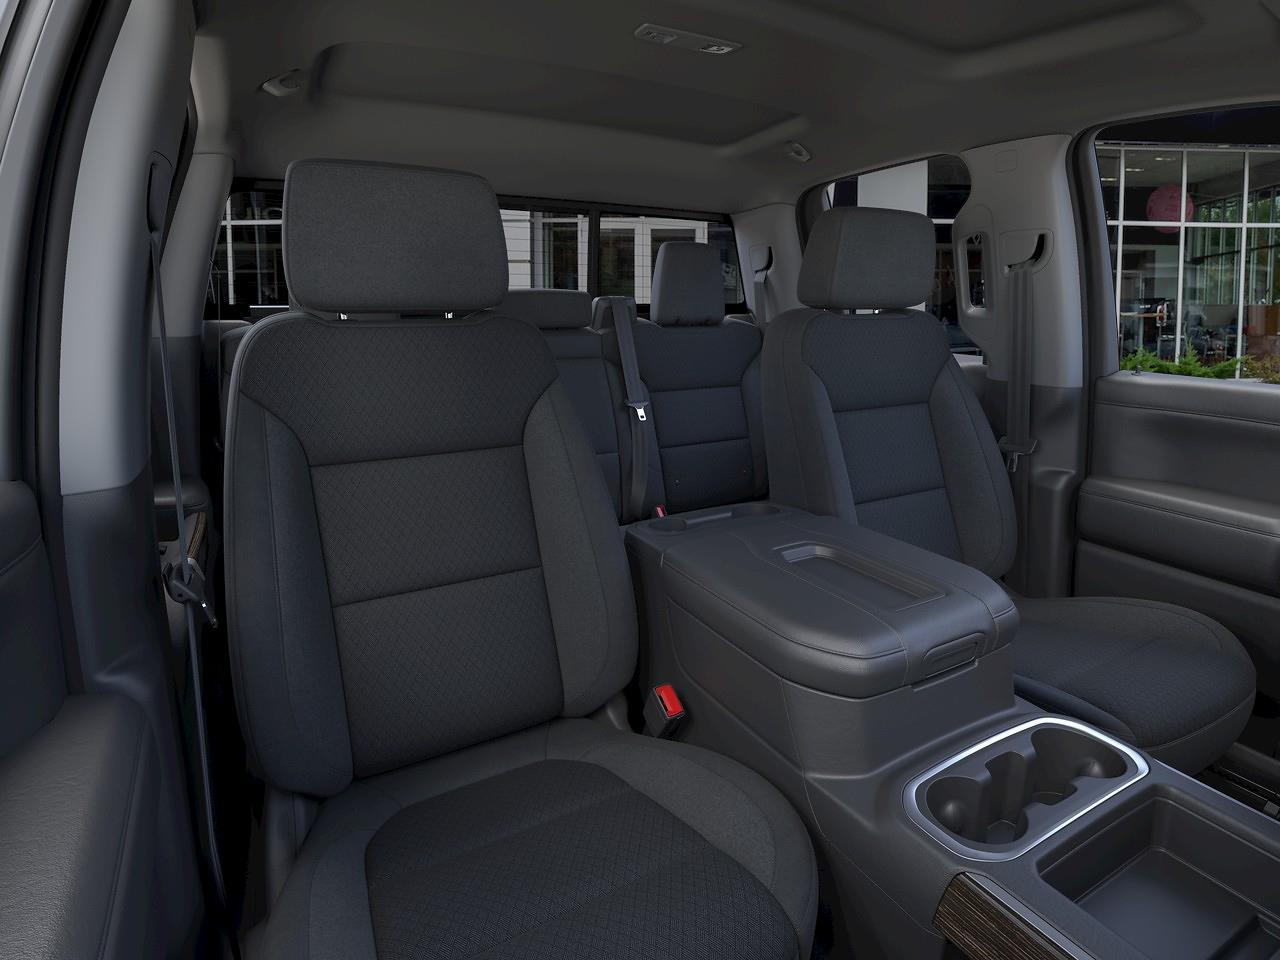 2021 GMC Sierra 1500 Double Cab 4x4, Pickup #241569 - photo 13